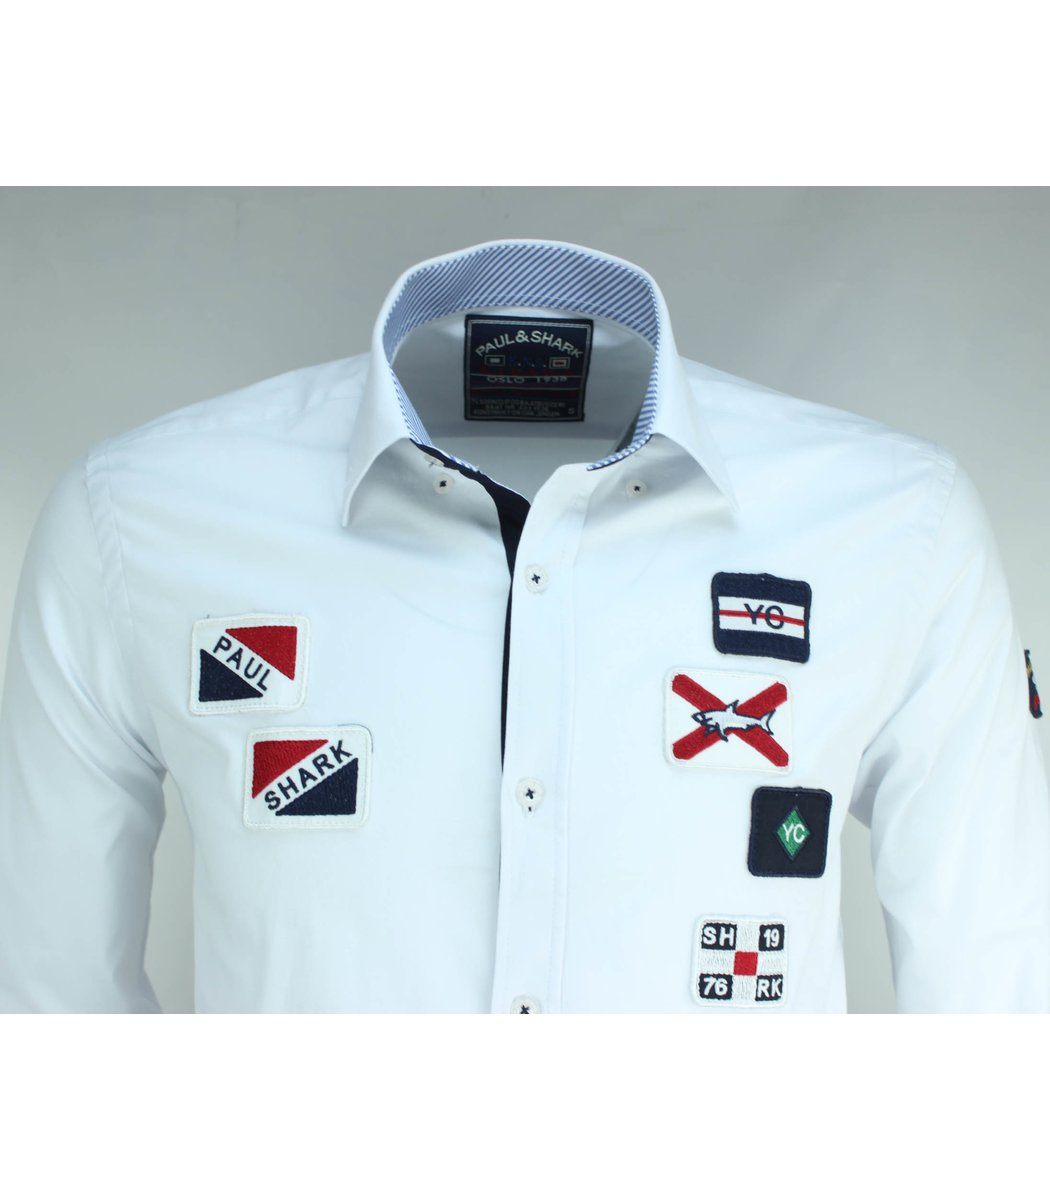 Белая рубашка Paul&Shark RP4 (2859)